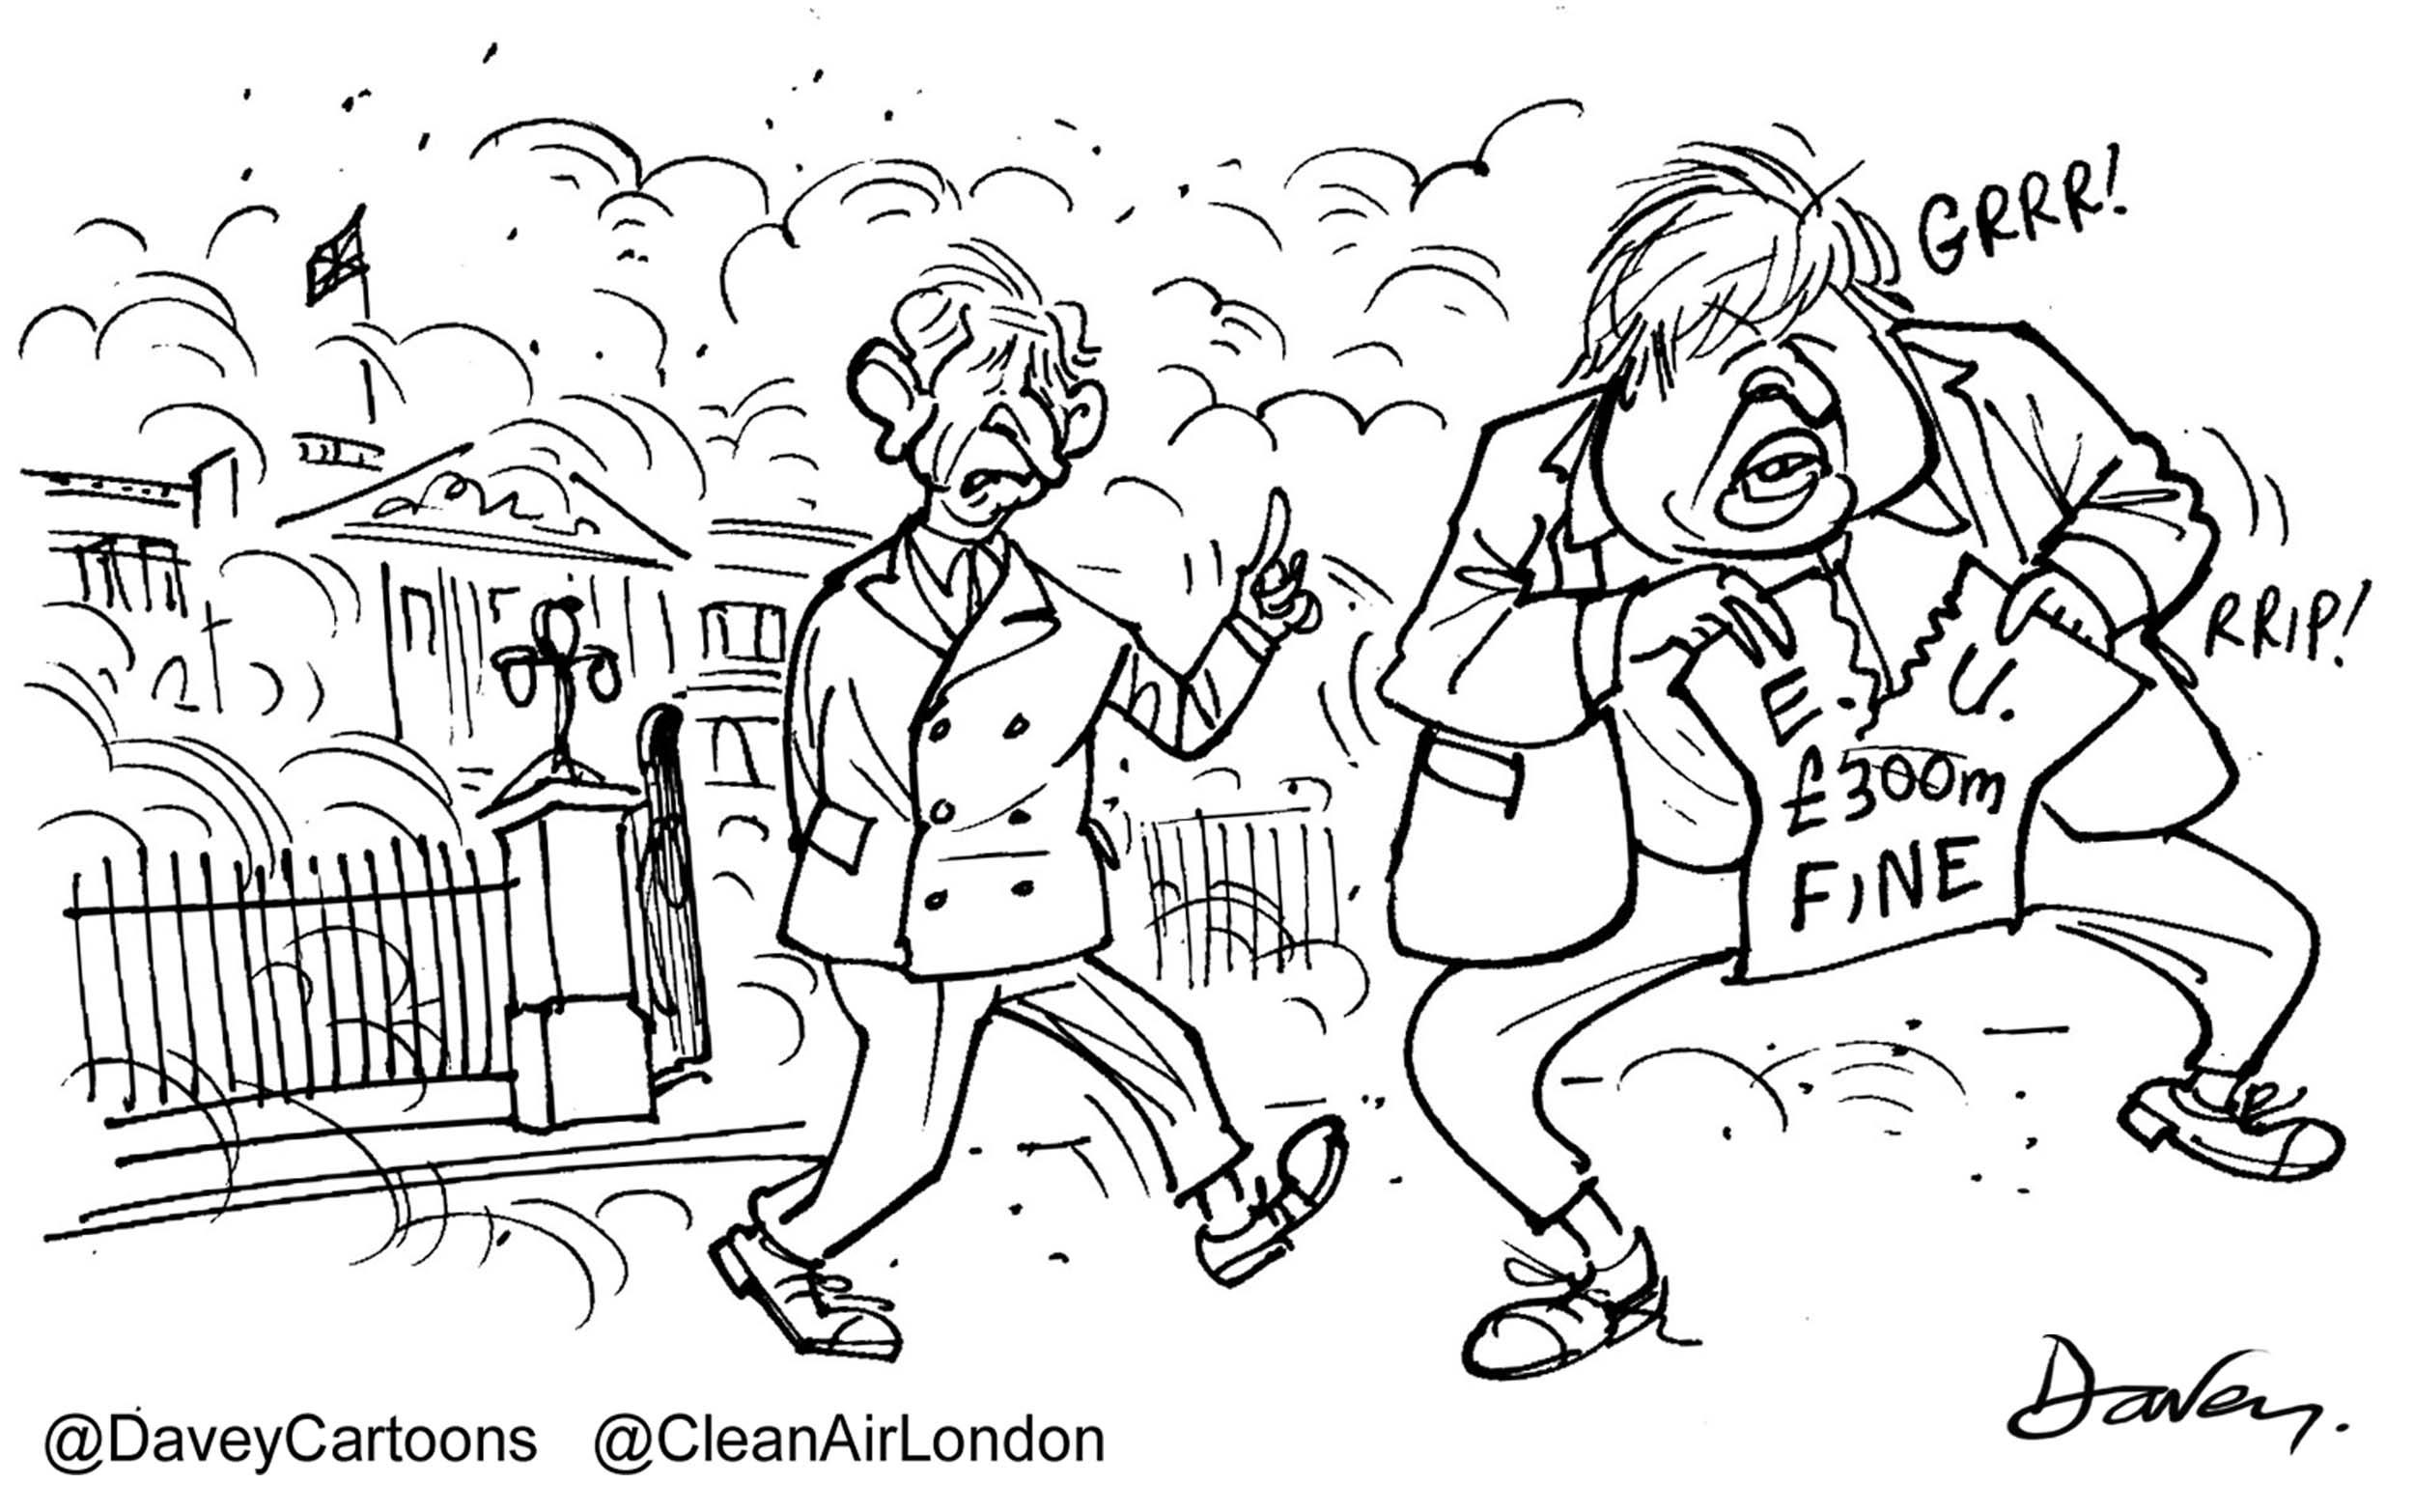 B_Prince Charles Boris and EU fines_250214